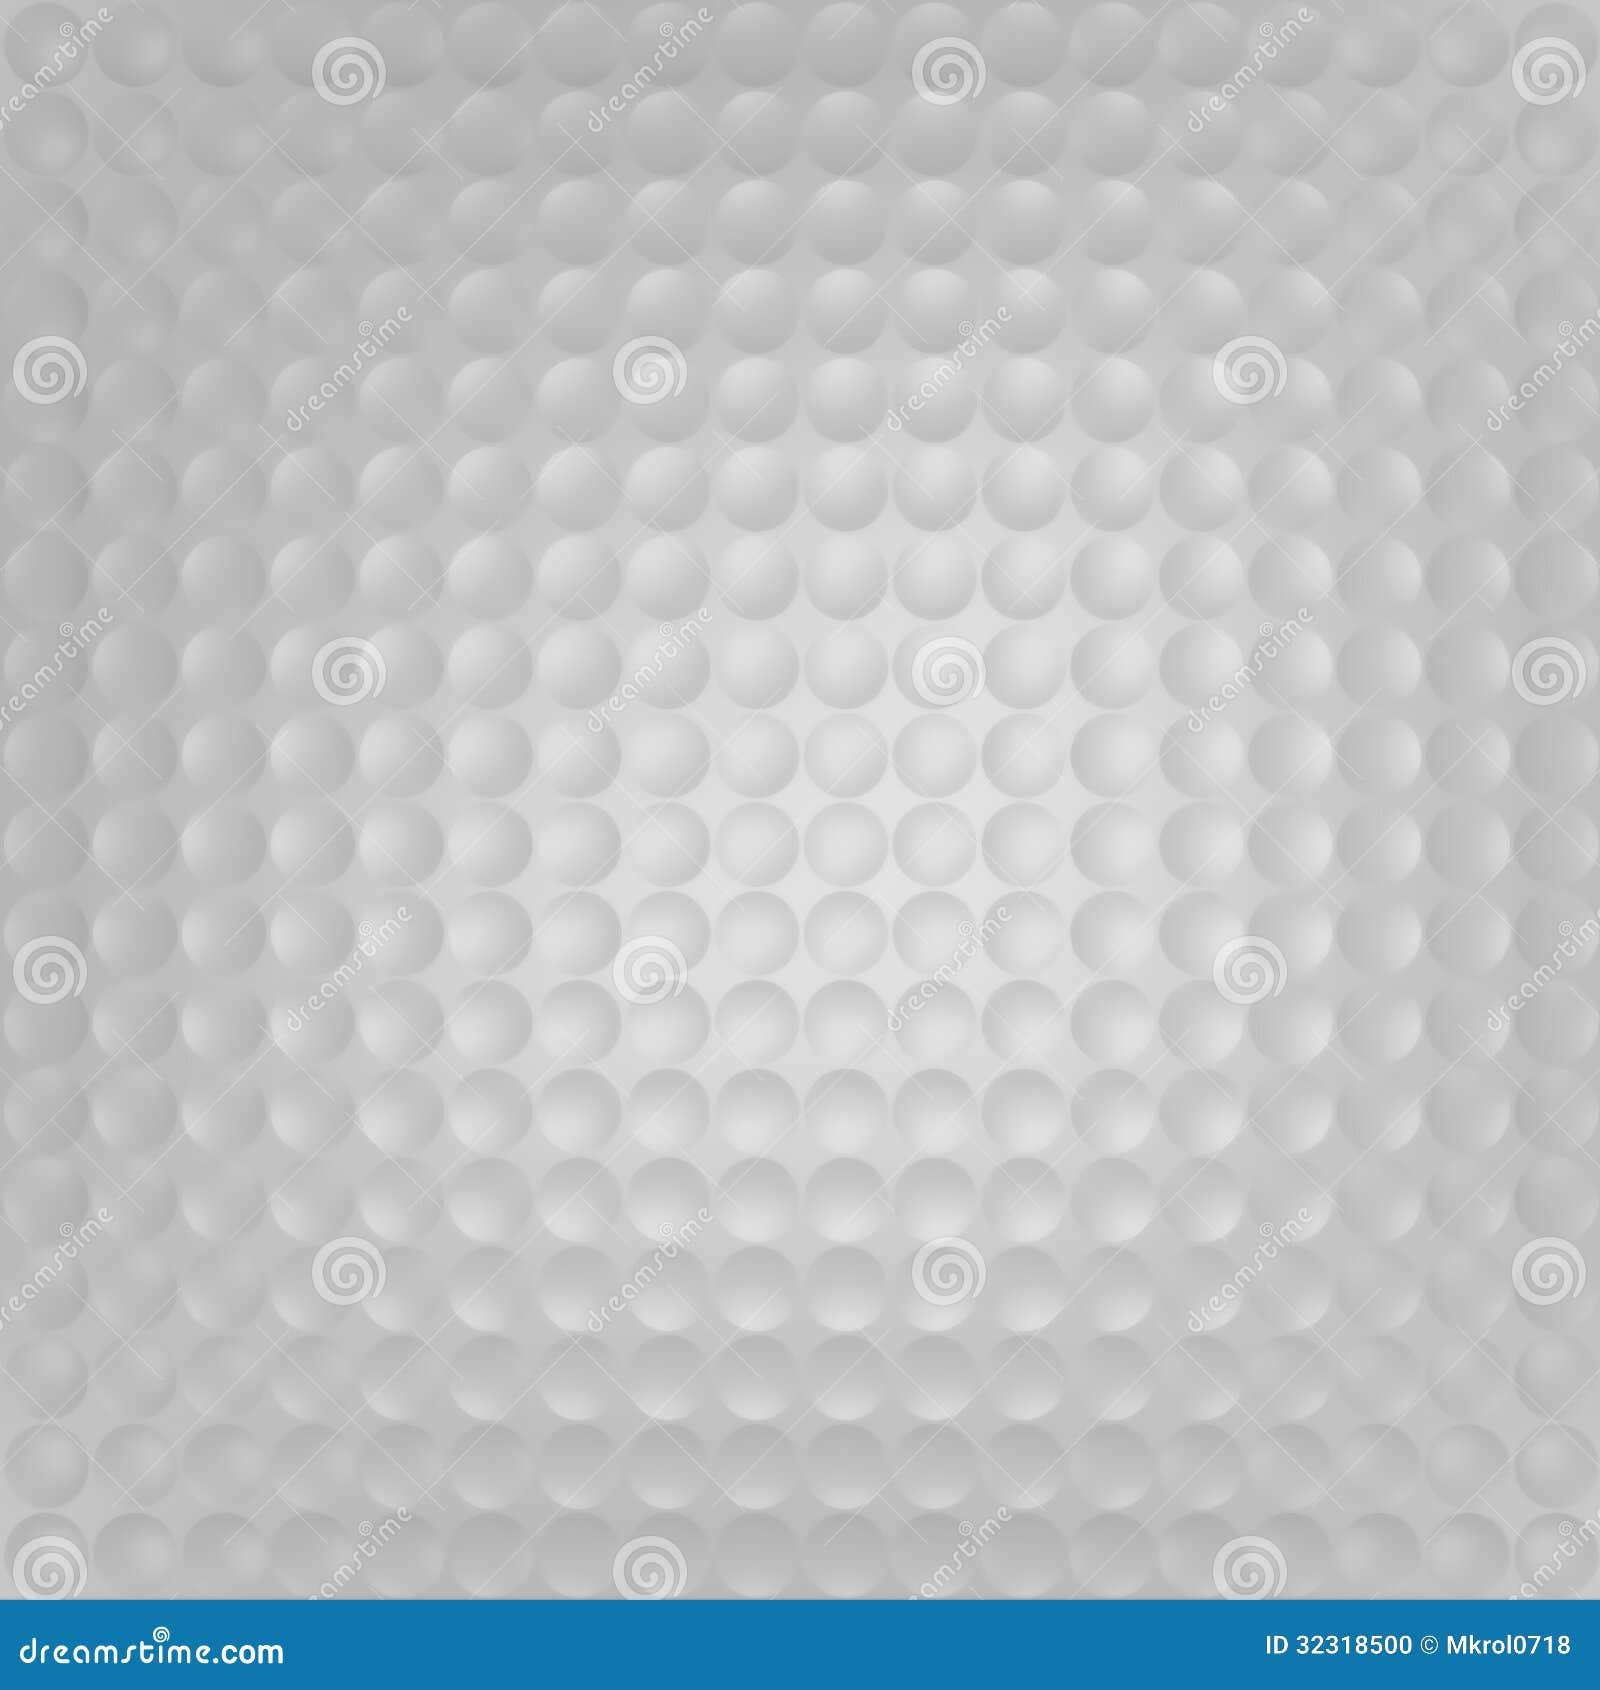 Stock Photo  Texture of a golf ballGolf Ball Background